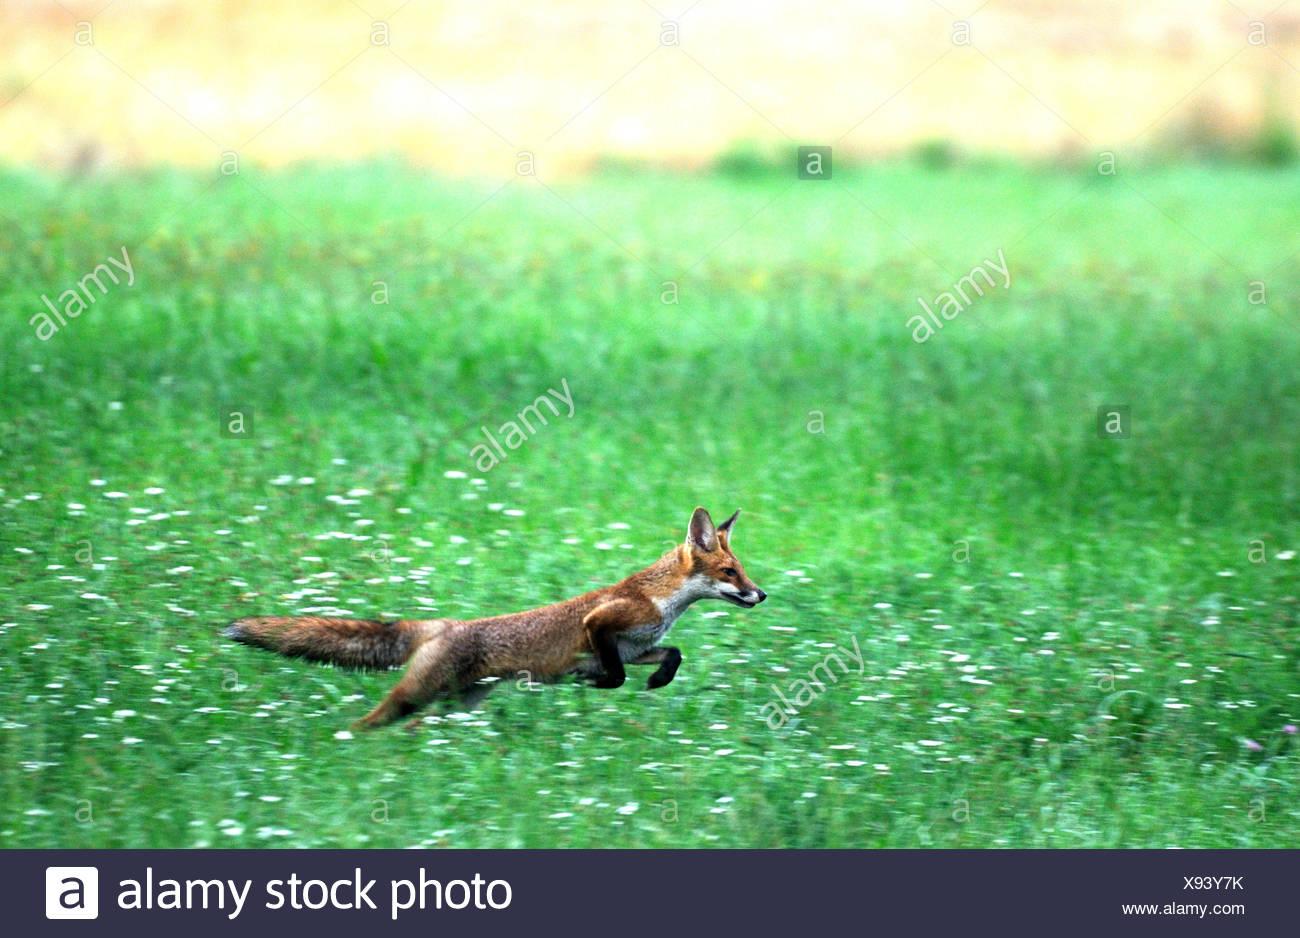 Red fox fox predator canids crafty European fox Vulpes vulpes foxes young grain-field cornfield jumping animal animals Germa - Stock Image